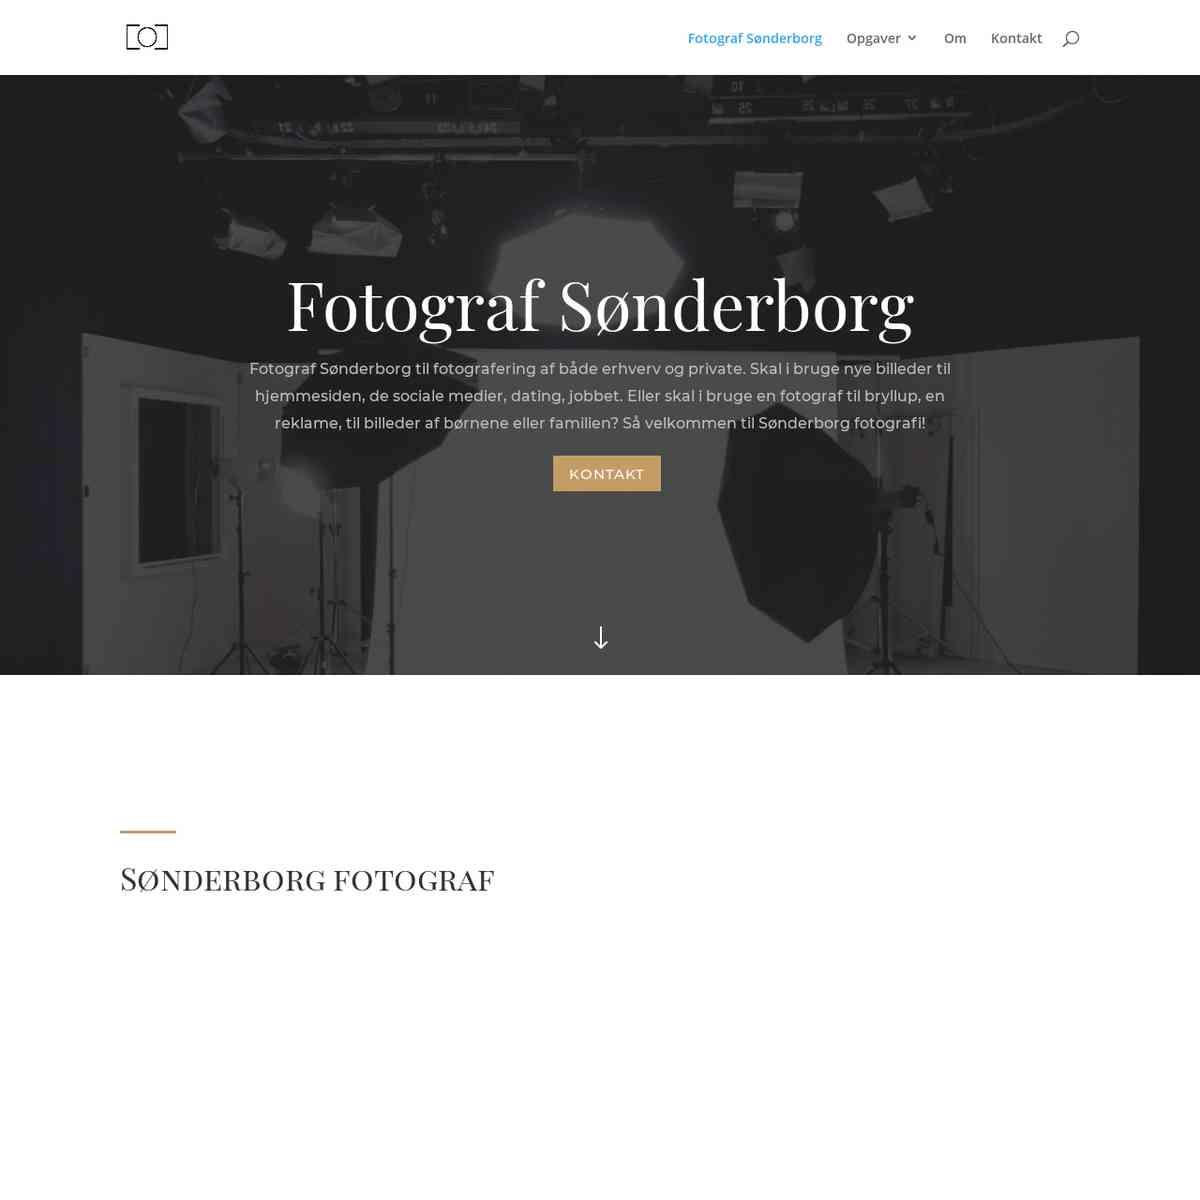 Fotograf Sønderborg